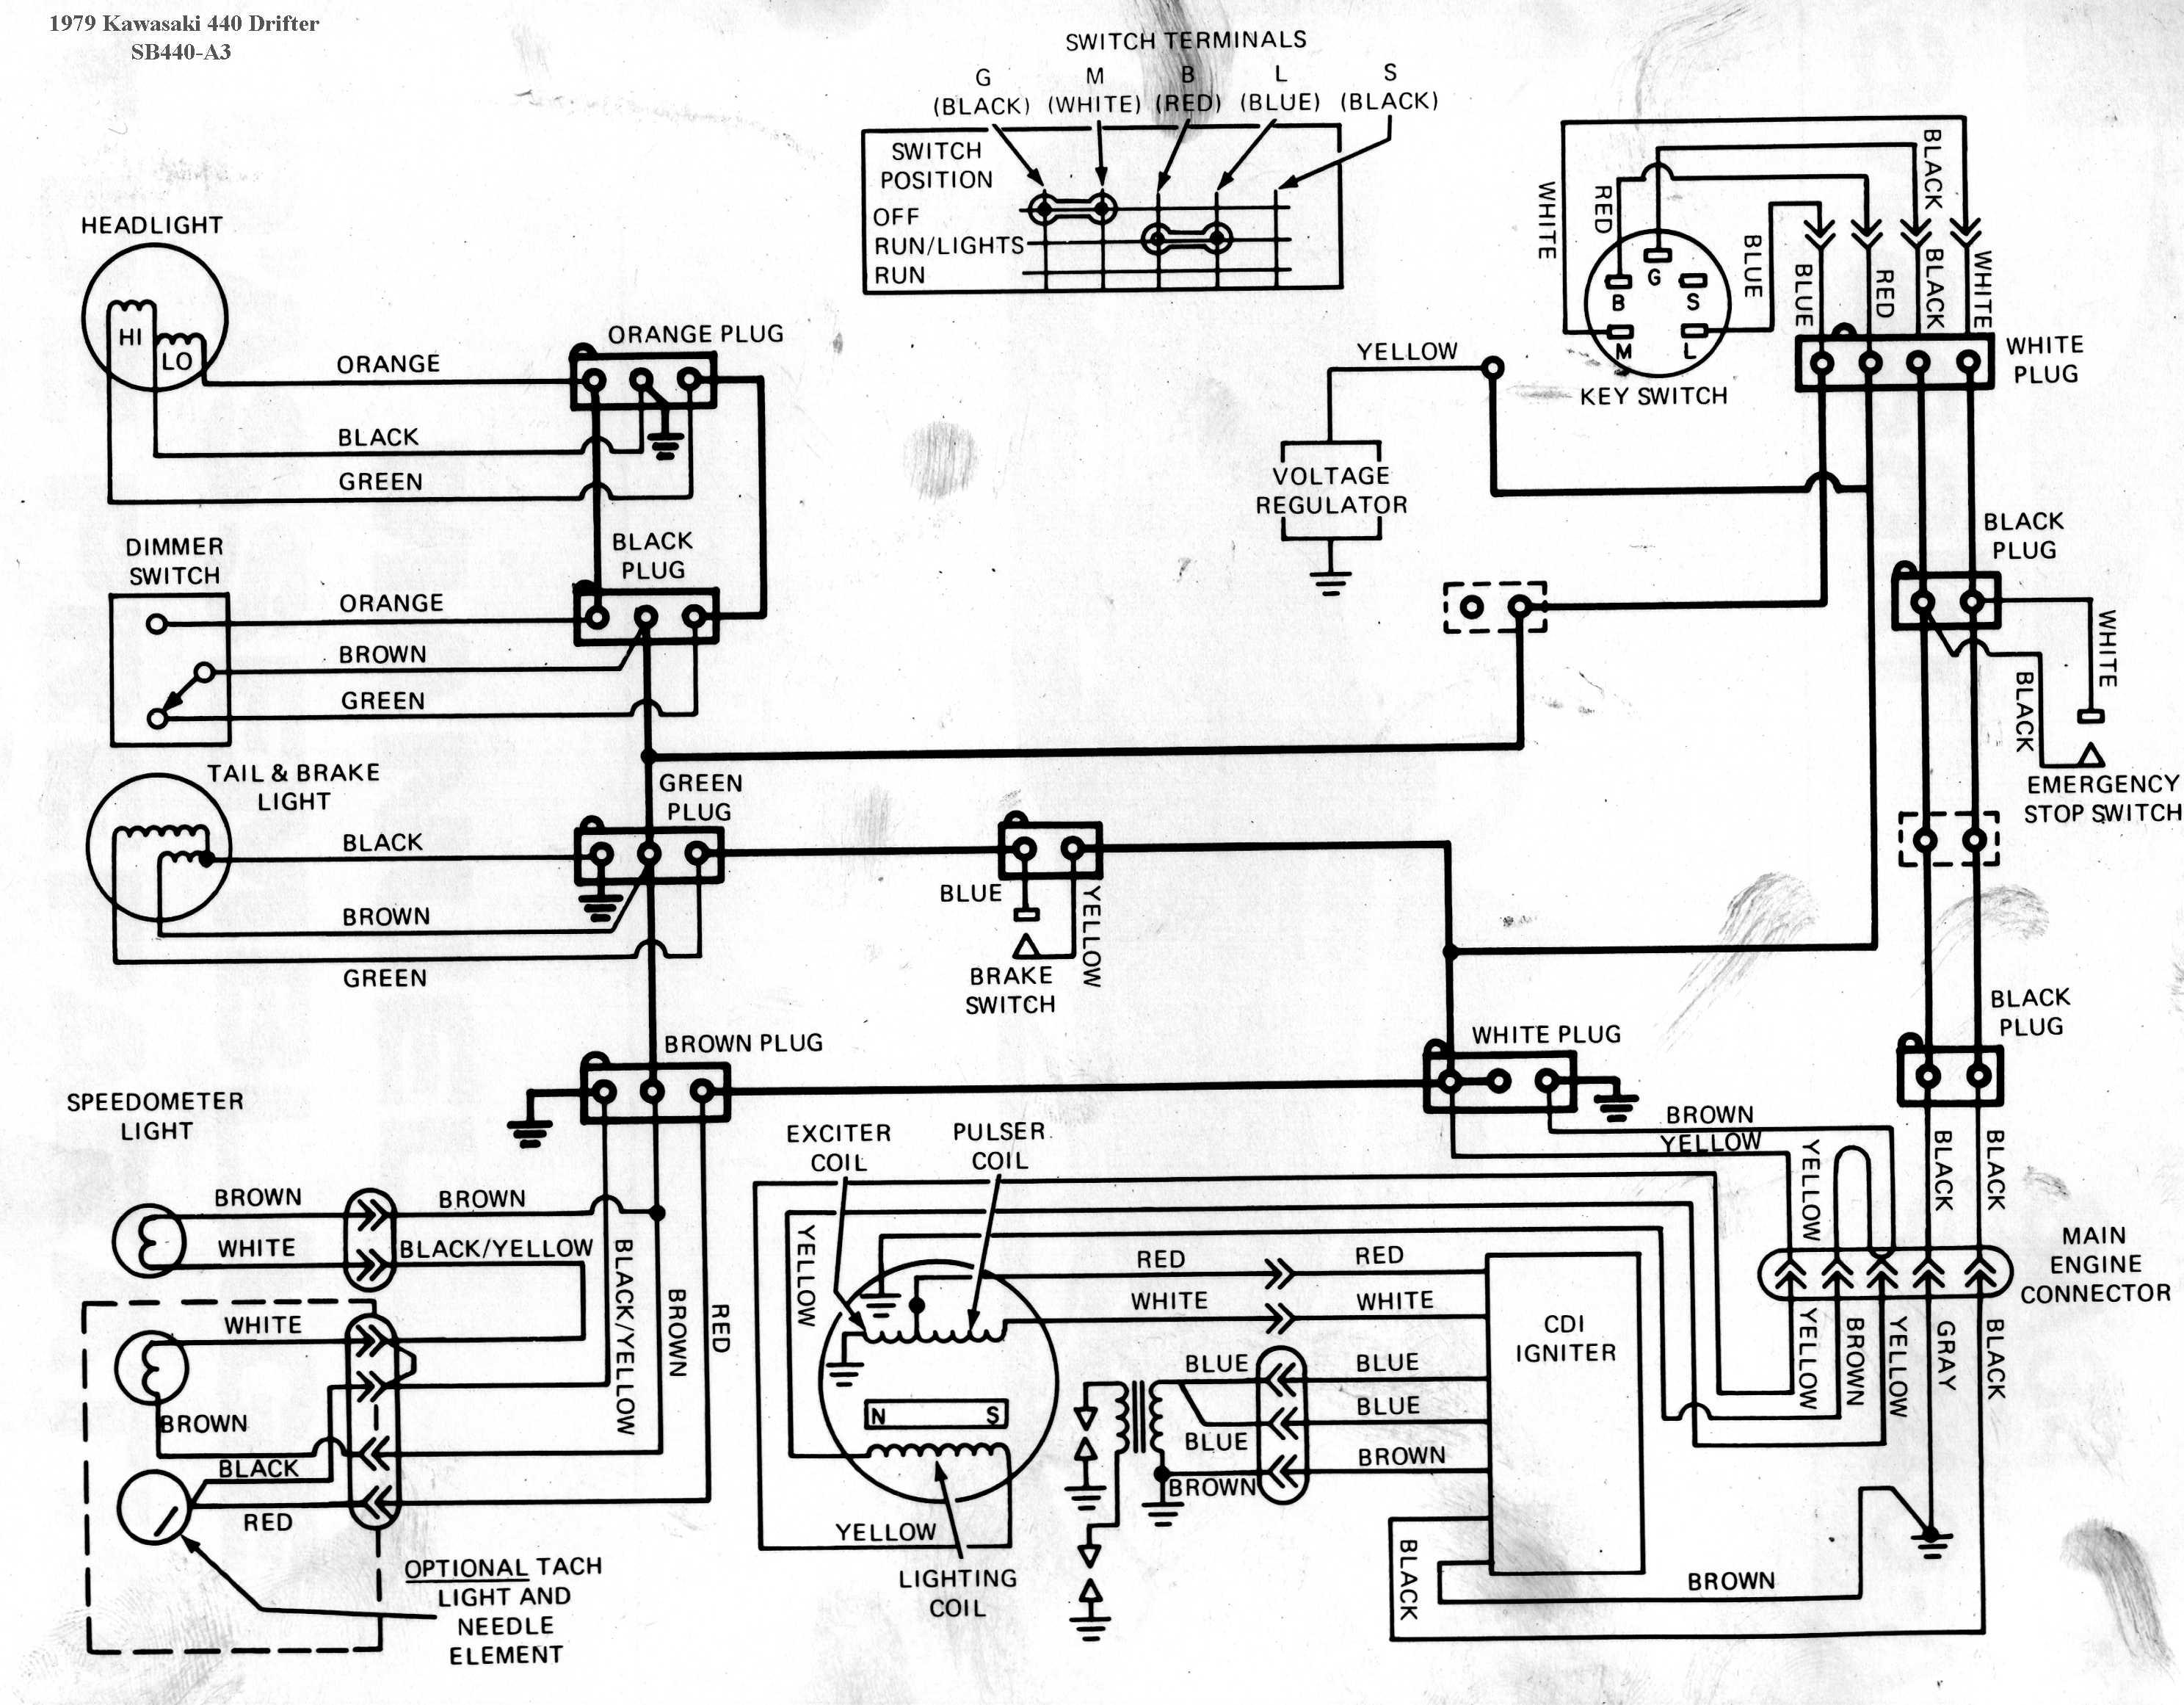 Kawasaki 500 Wiring Diagram